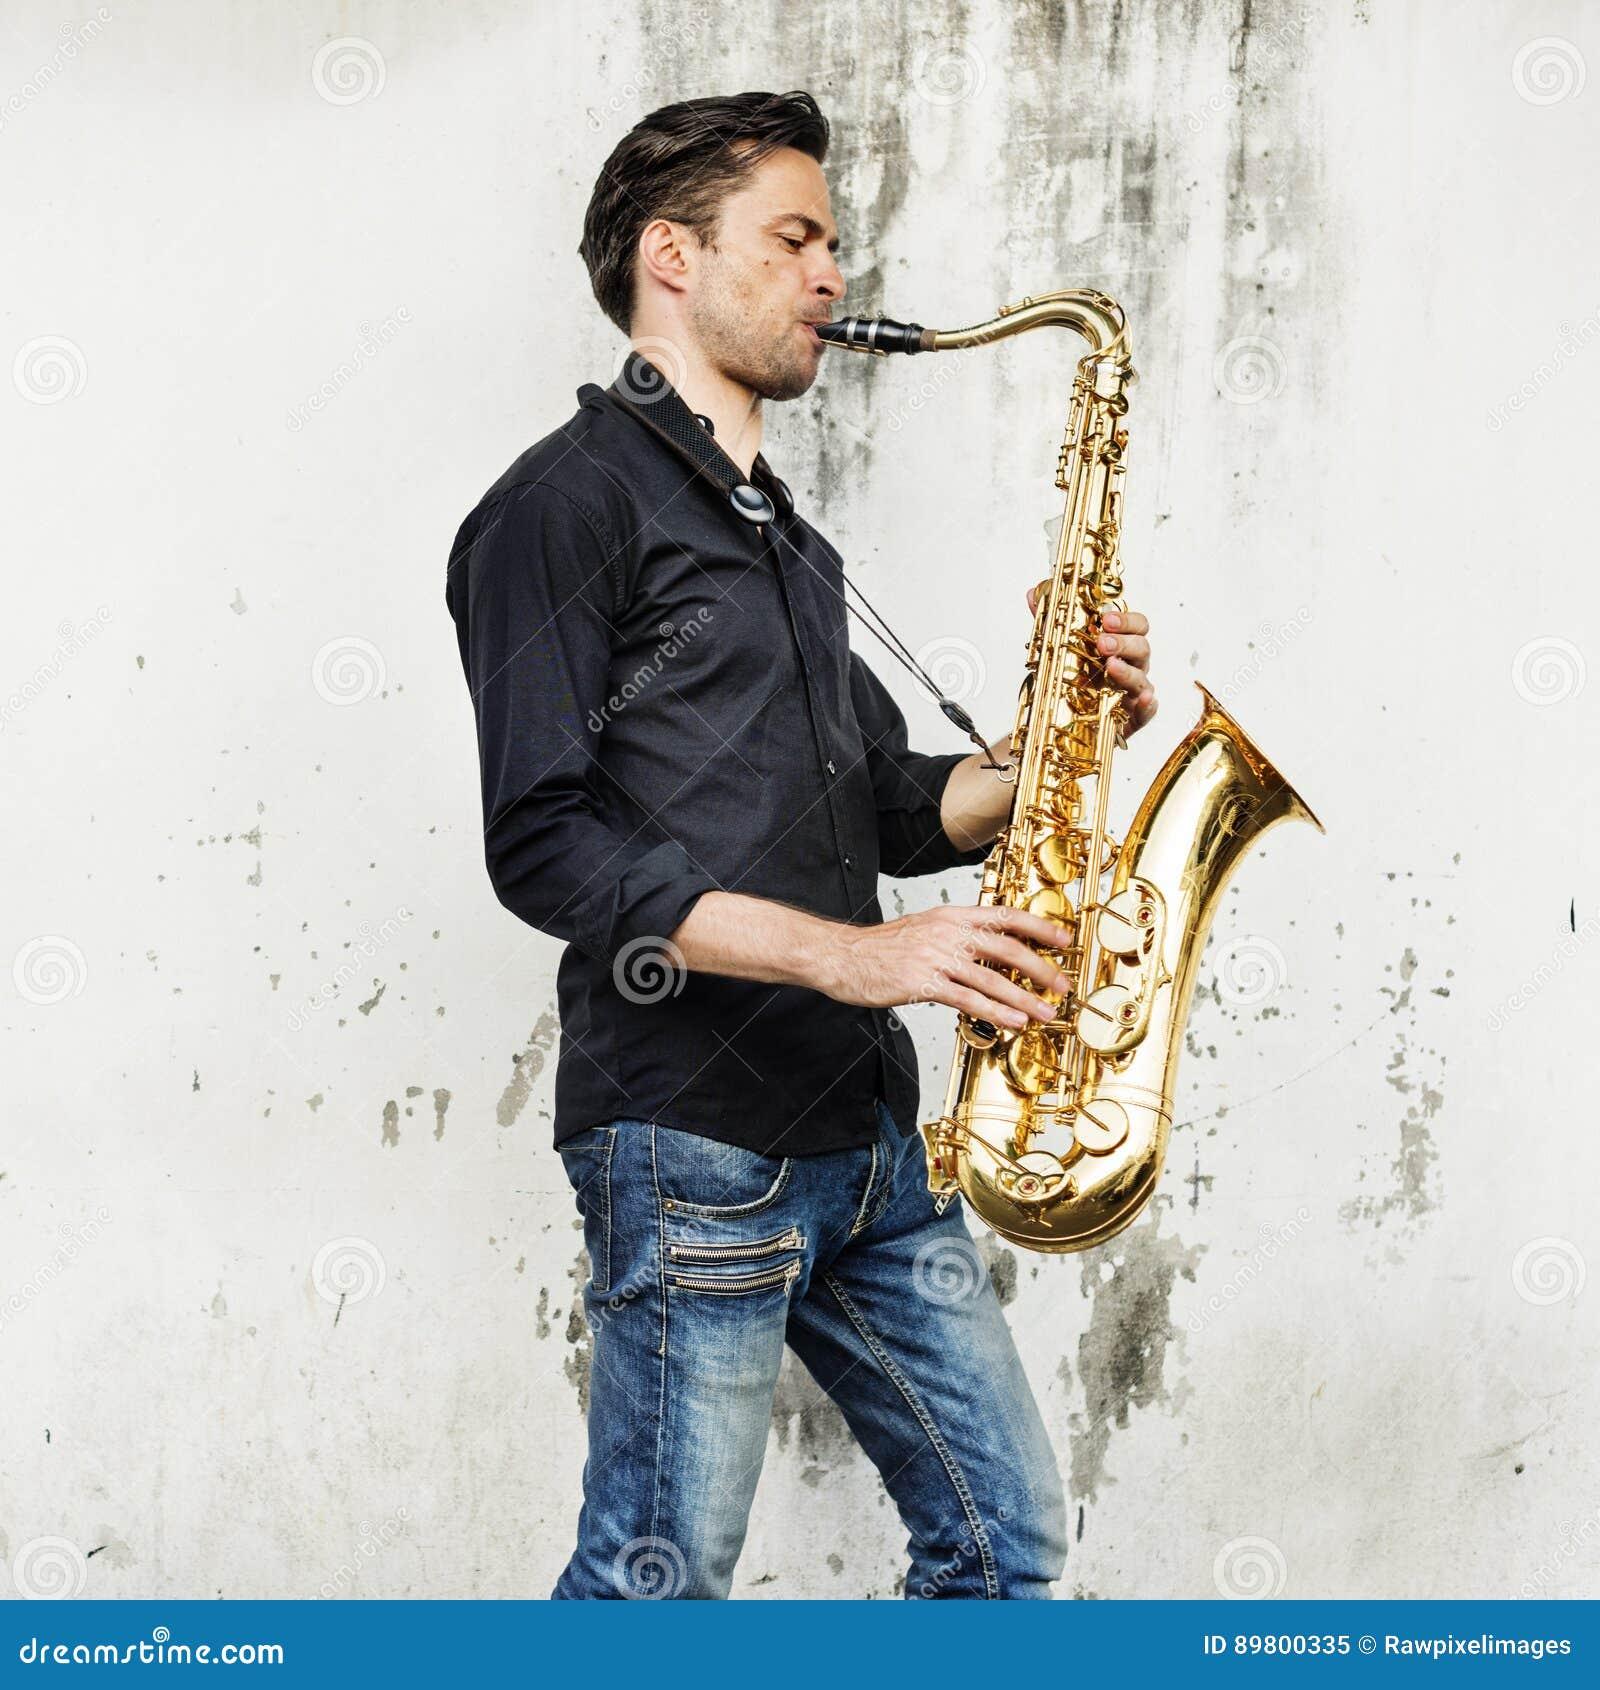 Músico Sax Concept de Alto Saxophone Artist Classical Jazz